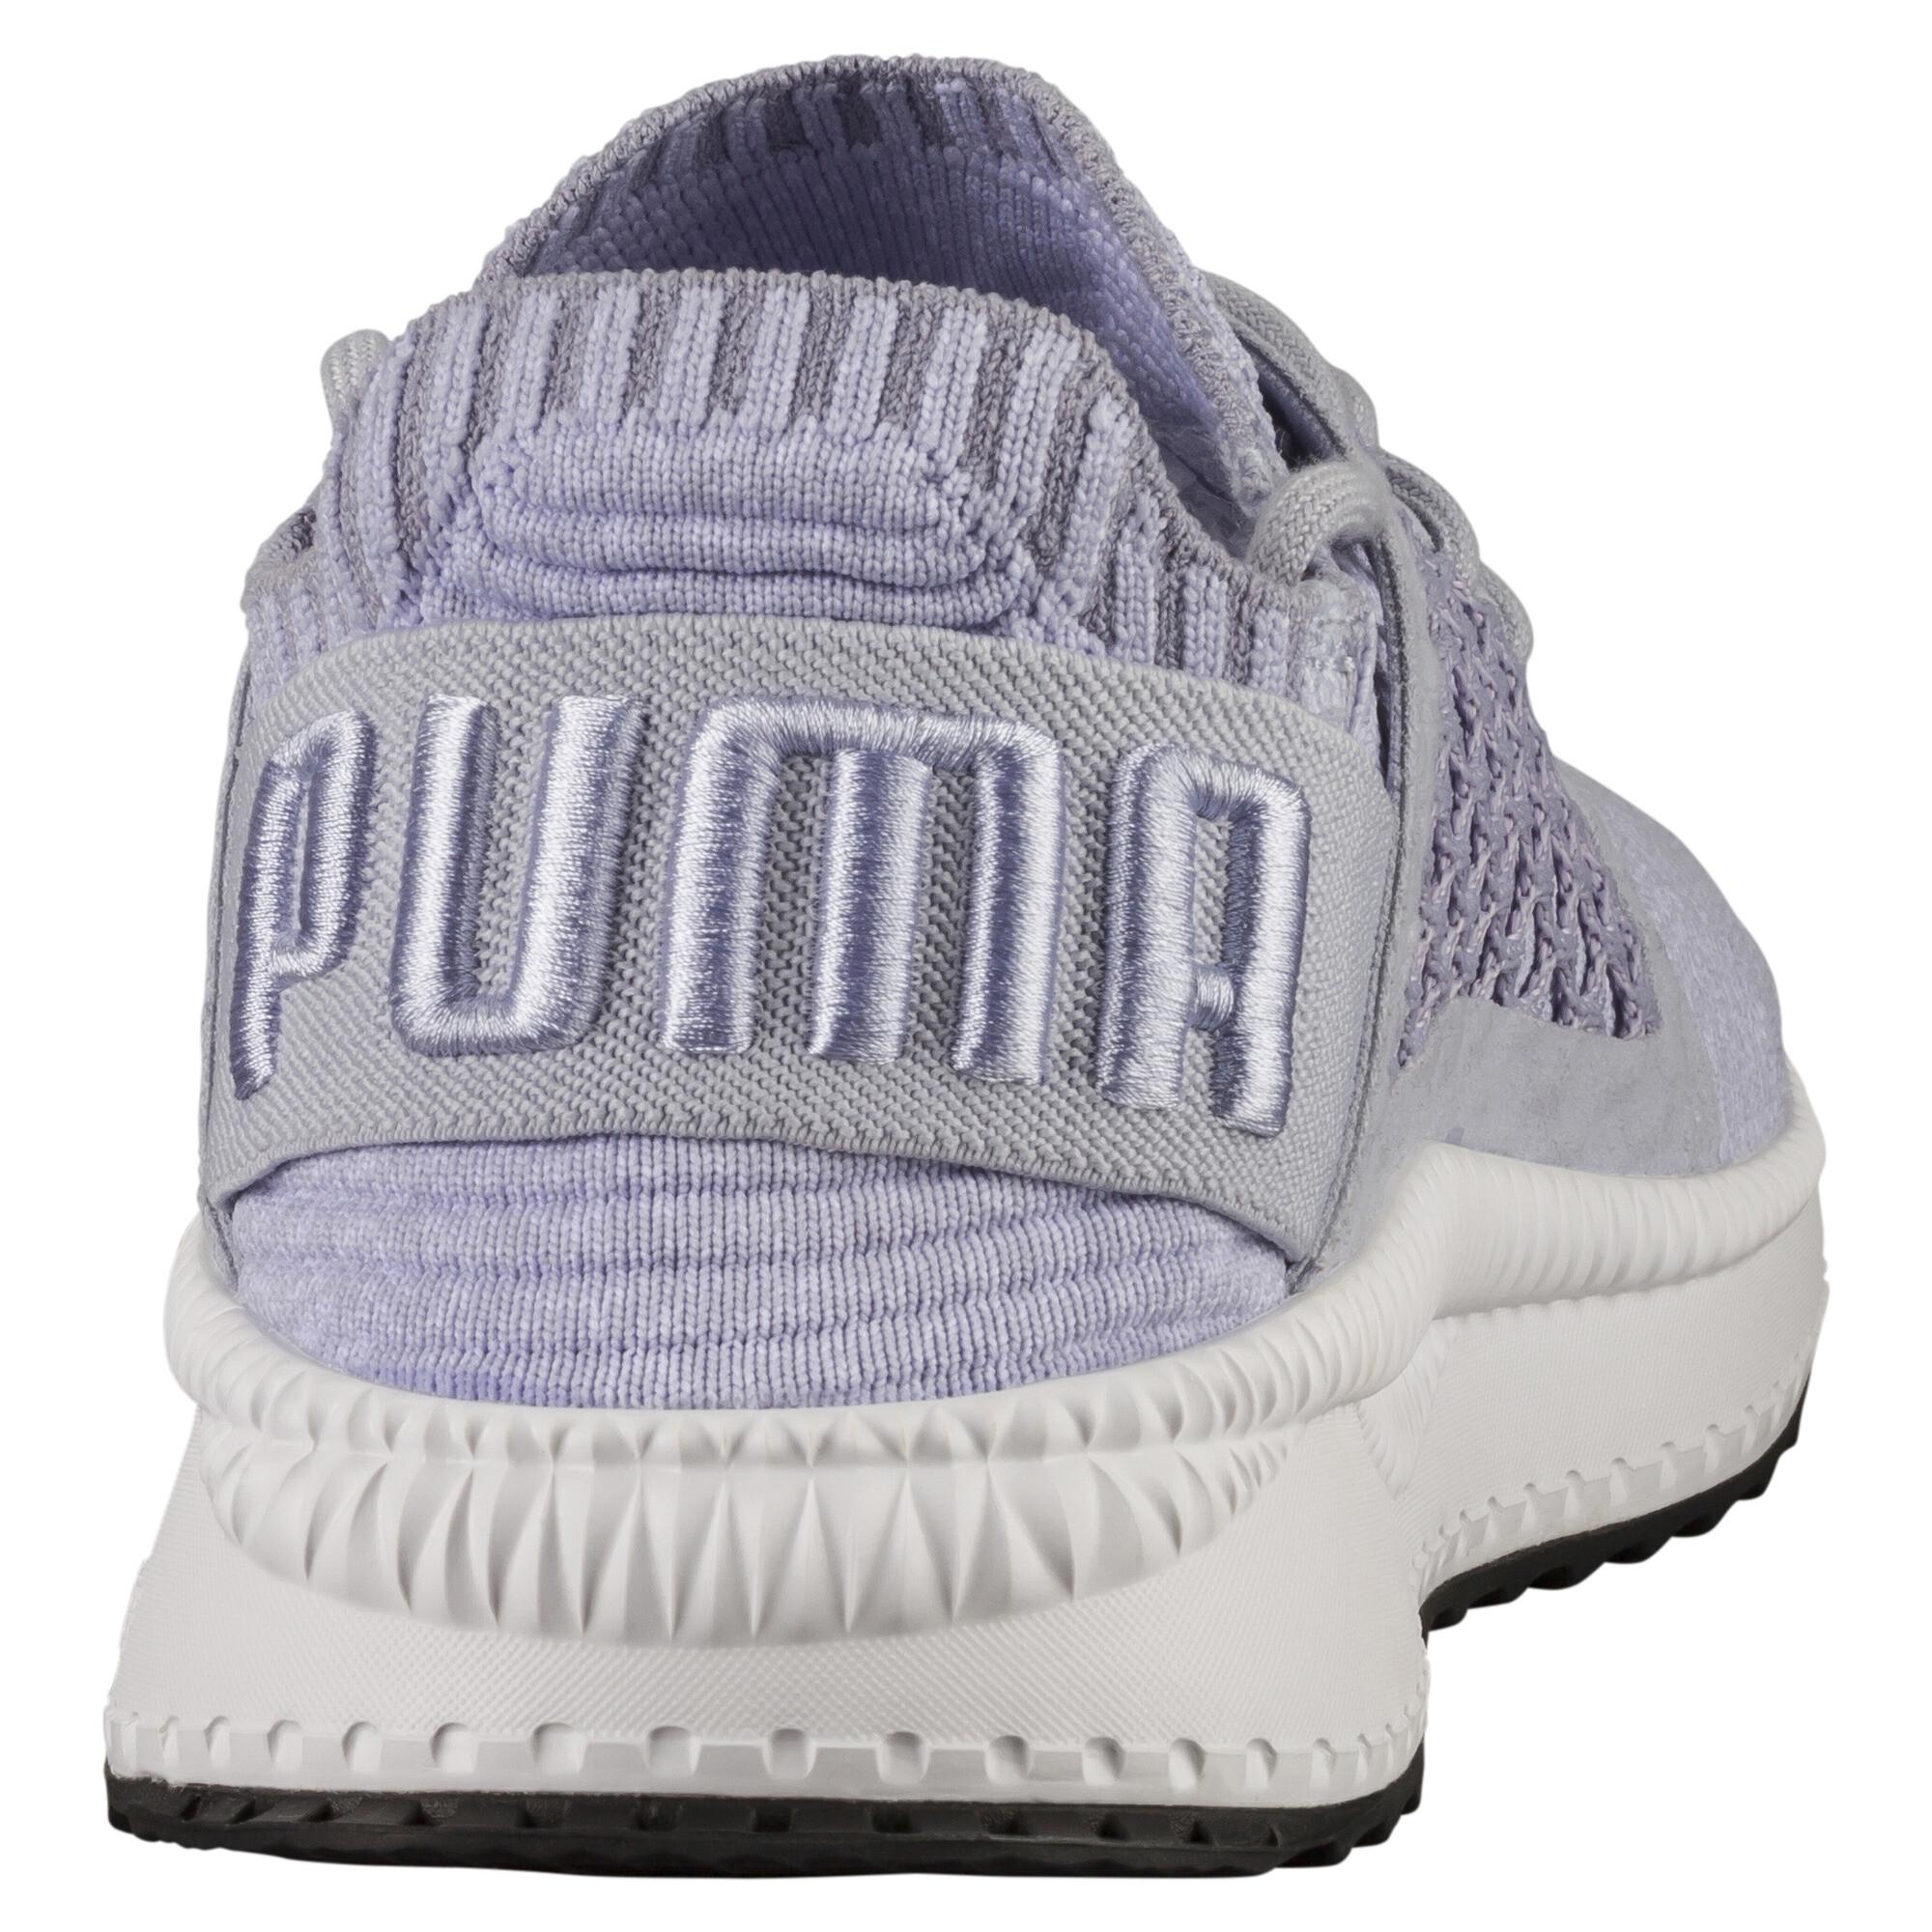 PUMA-TSUGI-NETFIT-evoKNIT-Sneaker-Frauen-Schuhe-Neu Indexbild 3